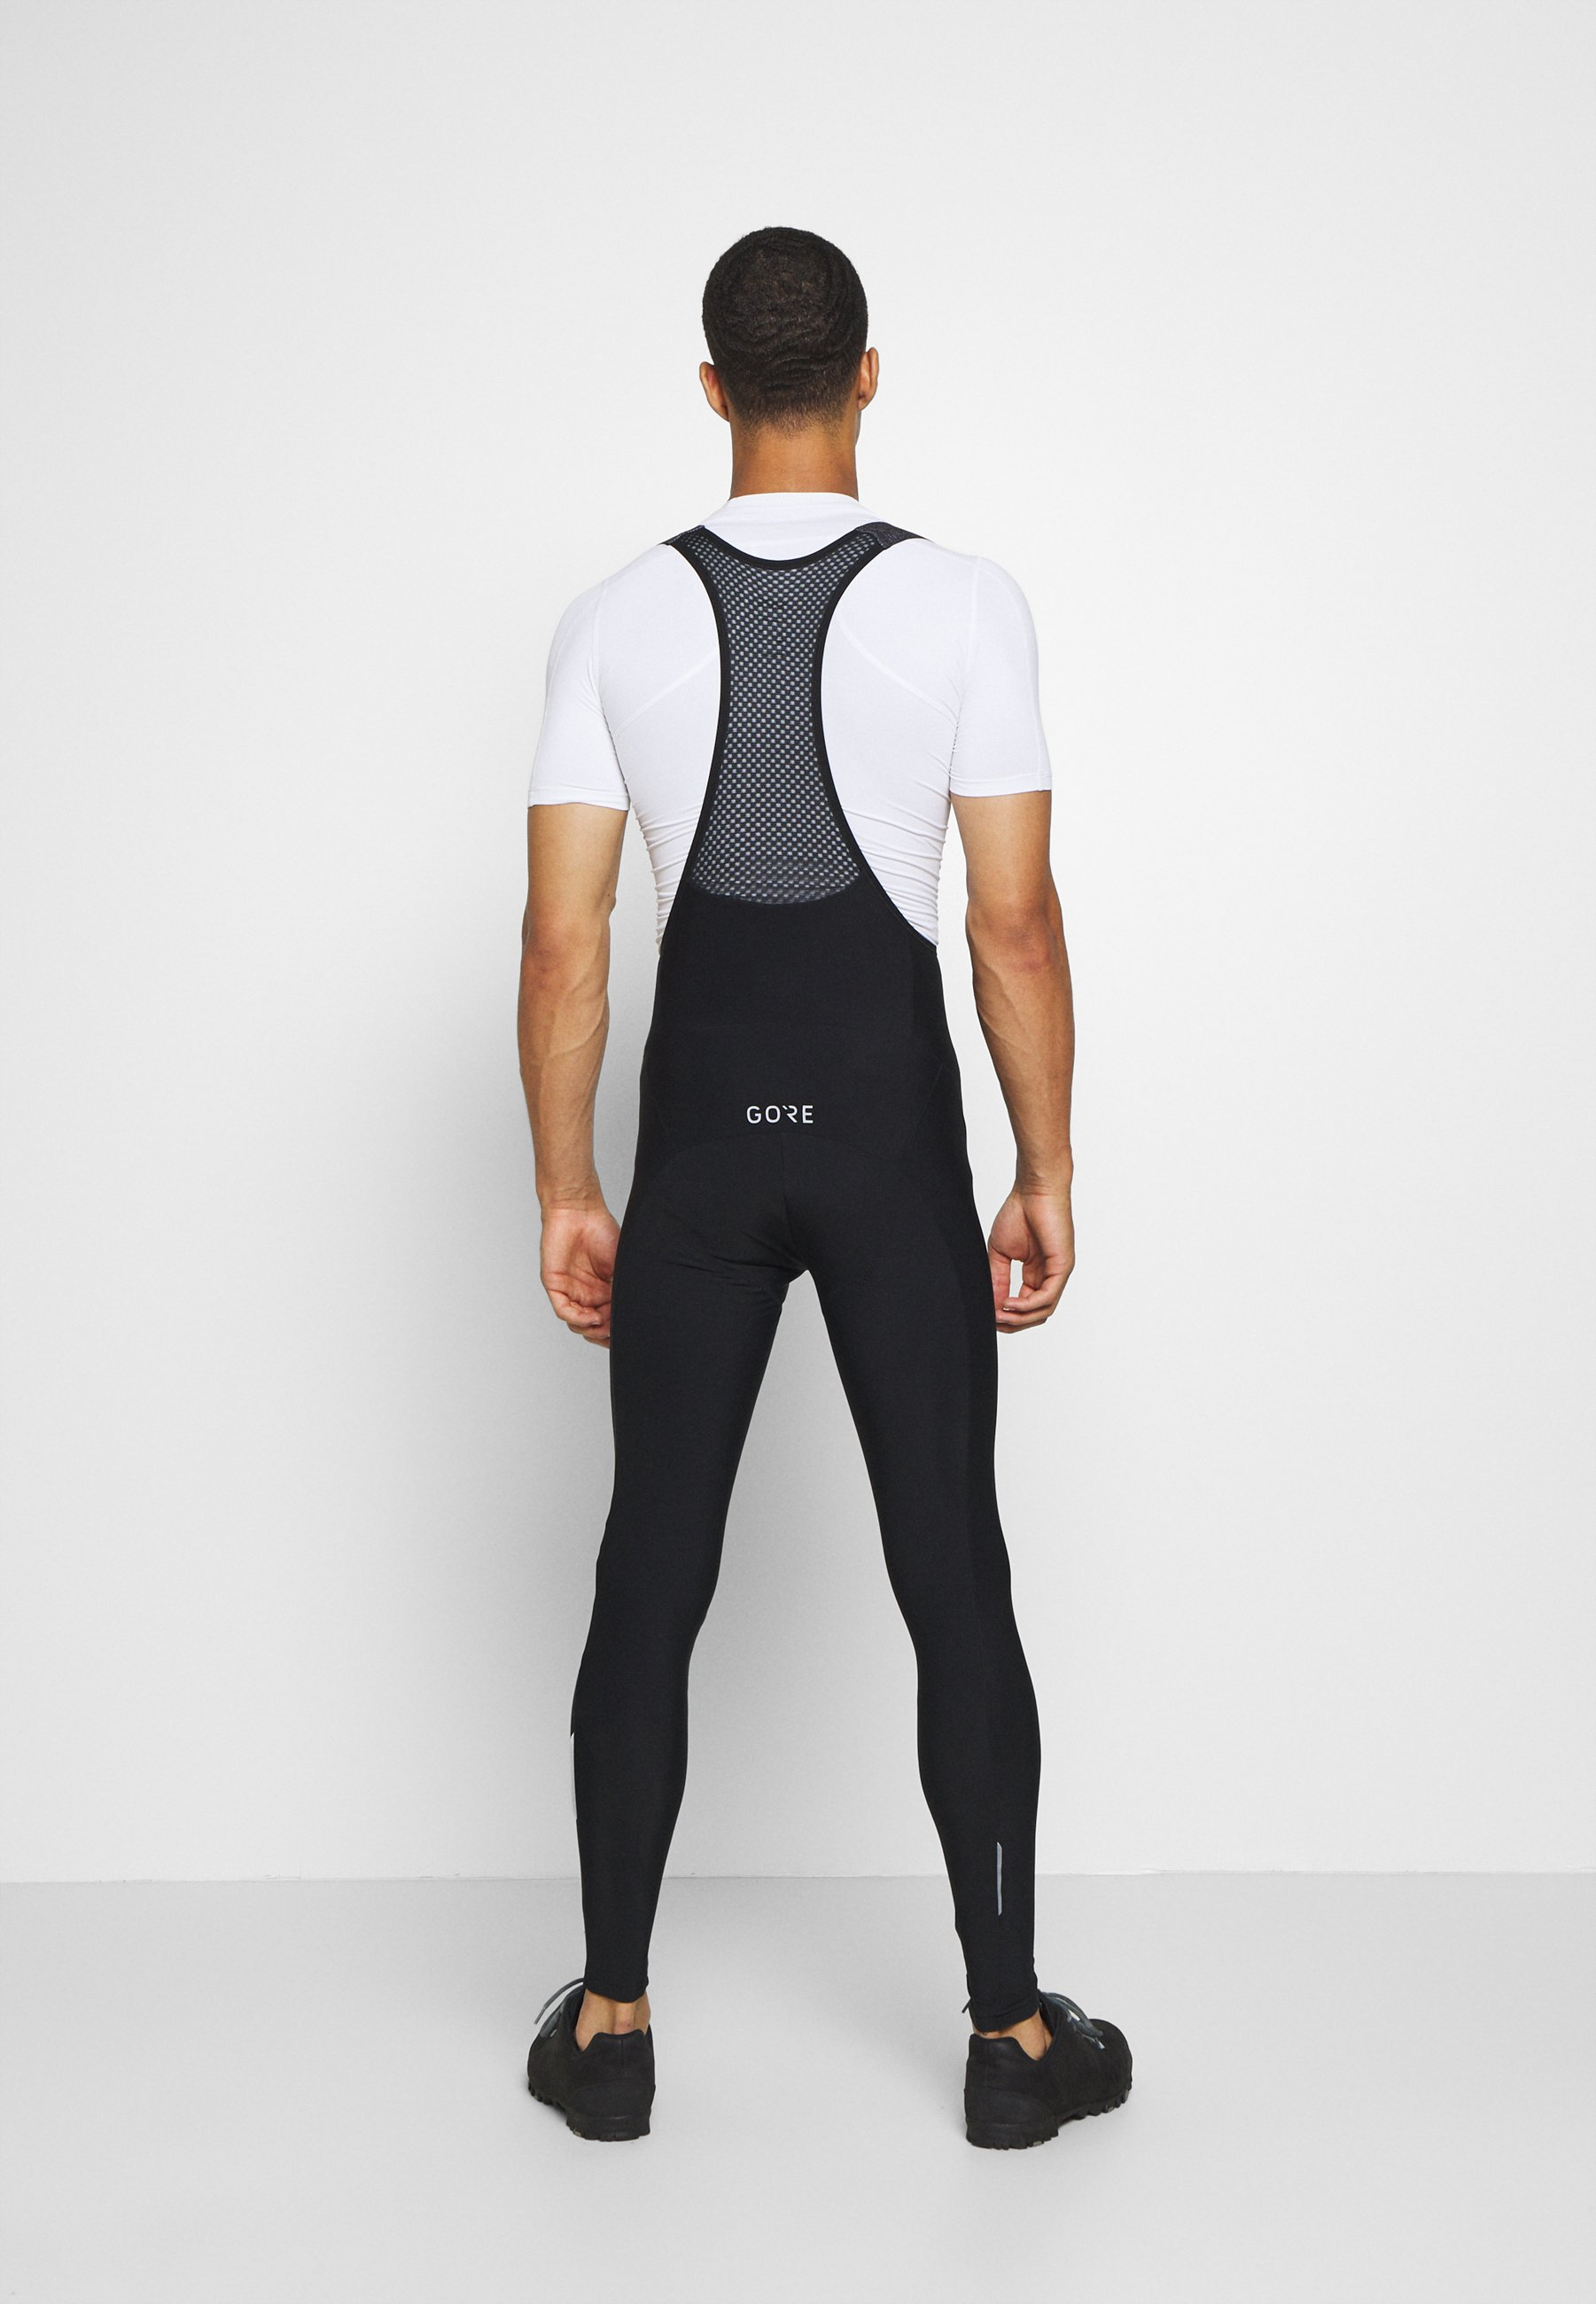 Reliable Men's Clothing Gore Wear C3 THERMO TRÄNGERHOSE Leggings black qhl7vspqb